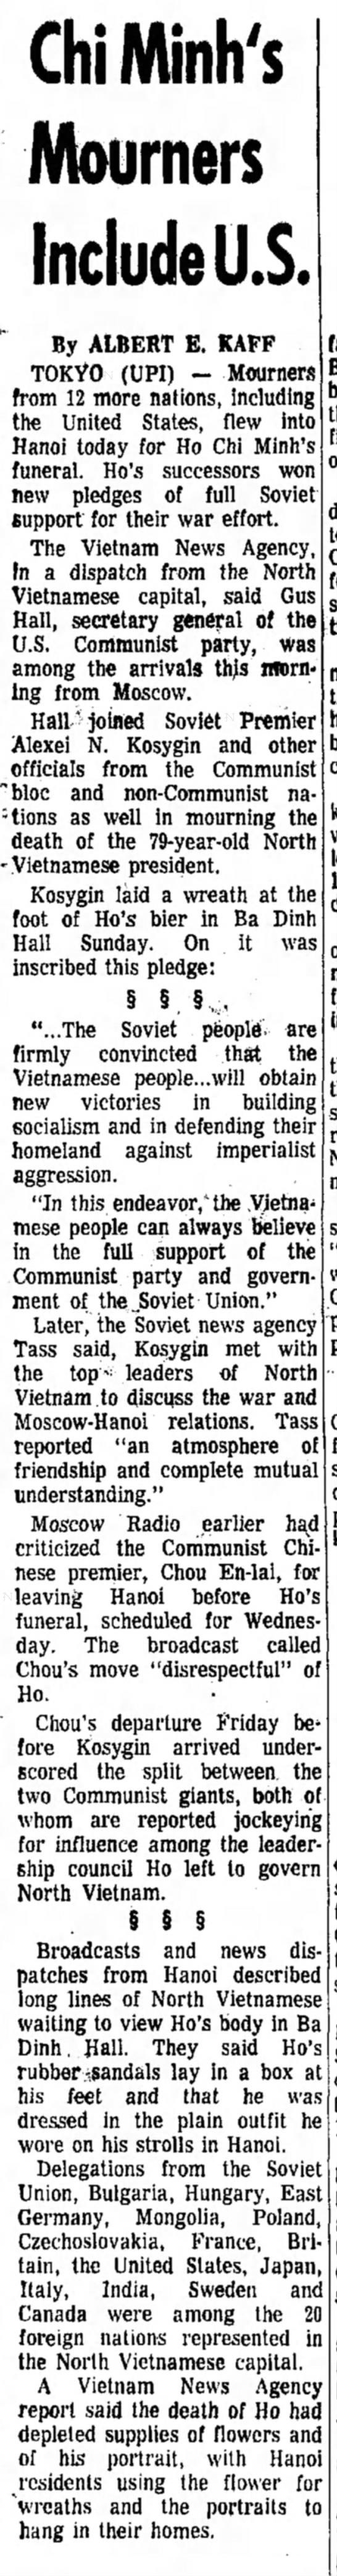 Sep 1969, Hanoi -